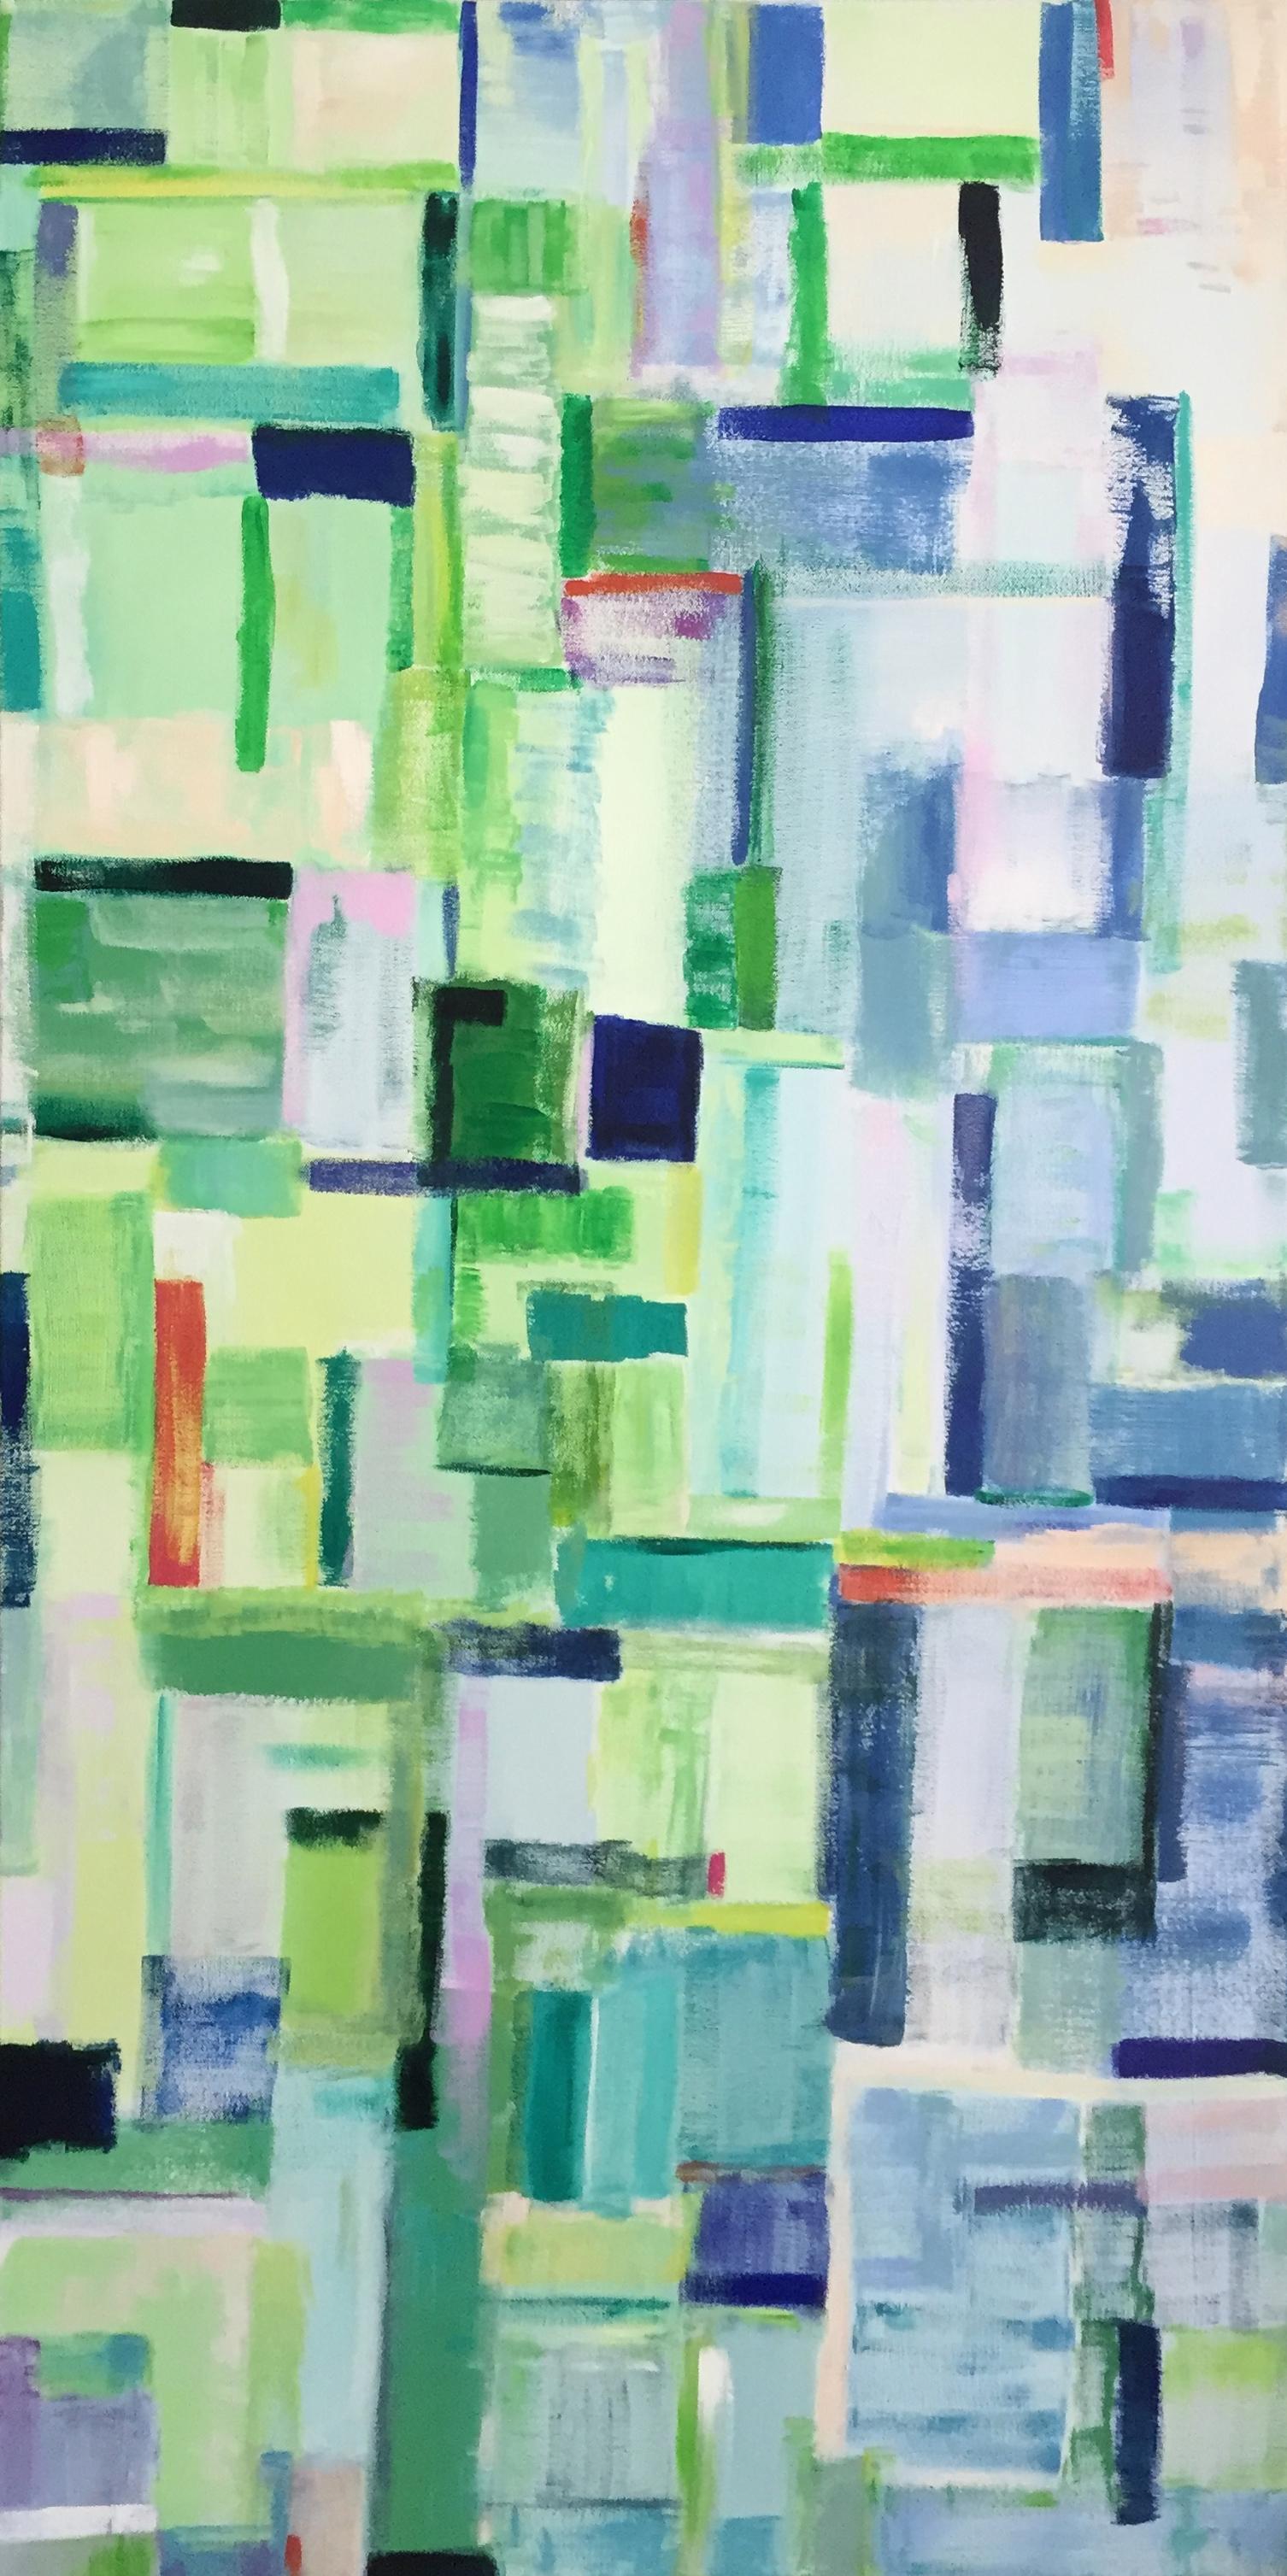 pastel city, 24 x 48, acrylic on canvas